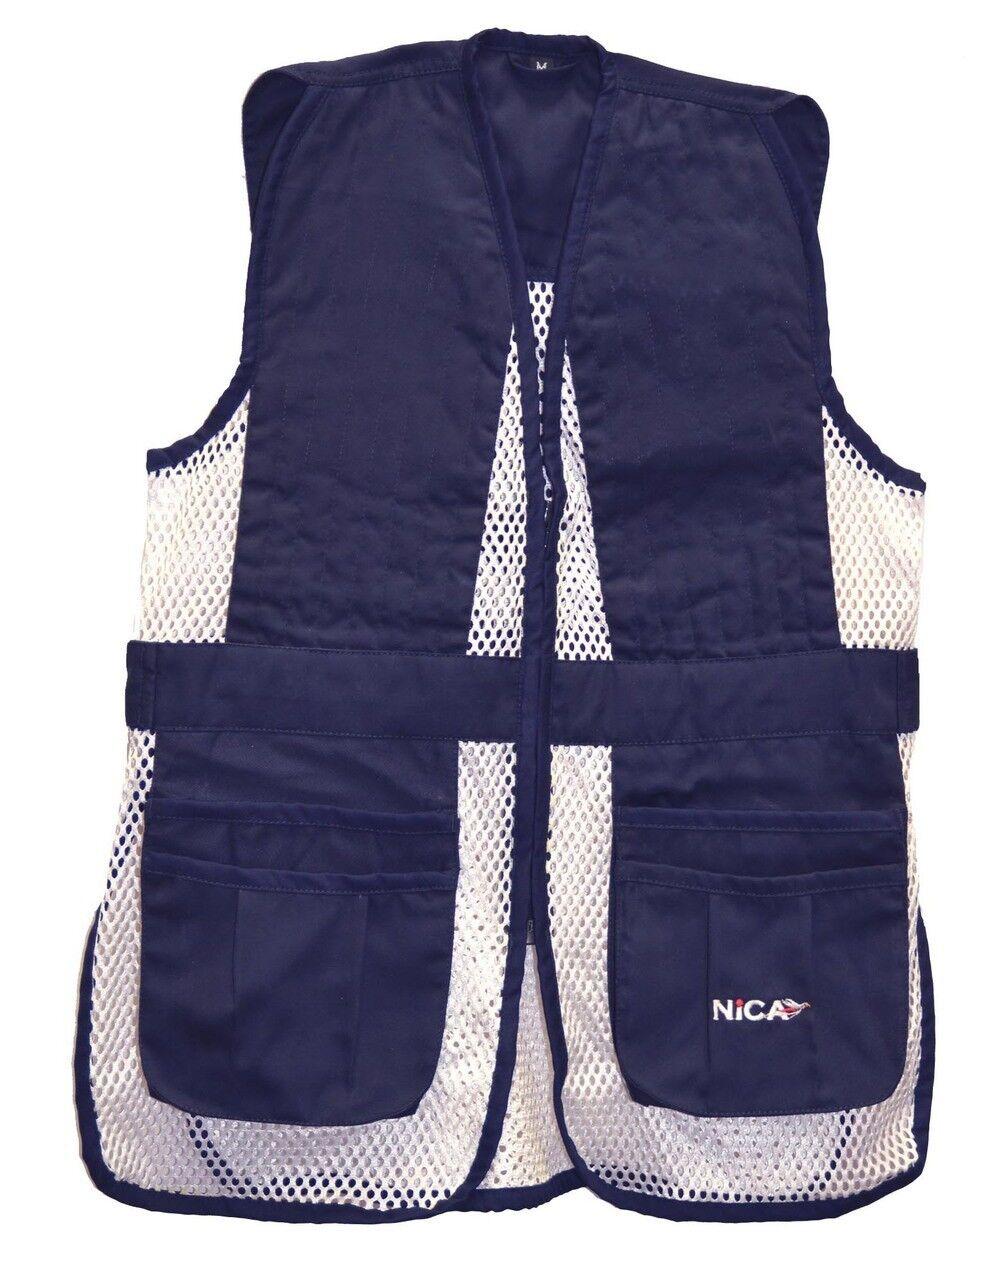 NICA Youth Kid's Ambi Shooting Vest-Navy